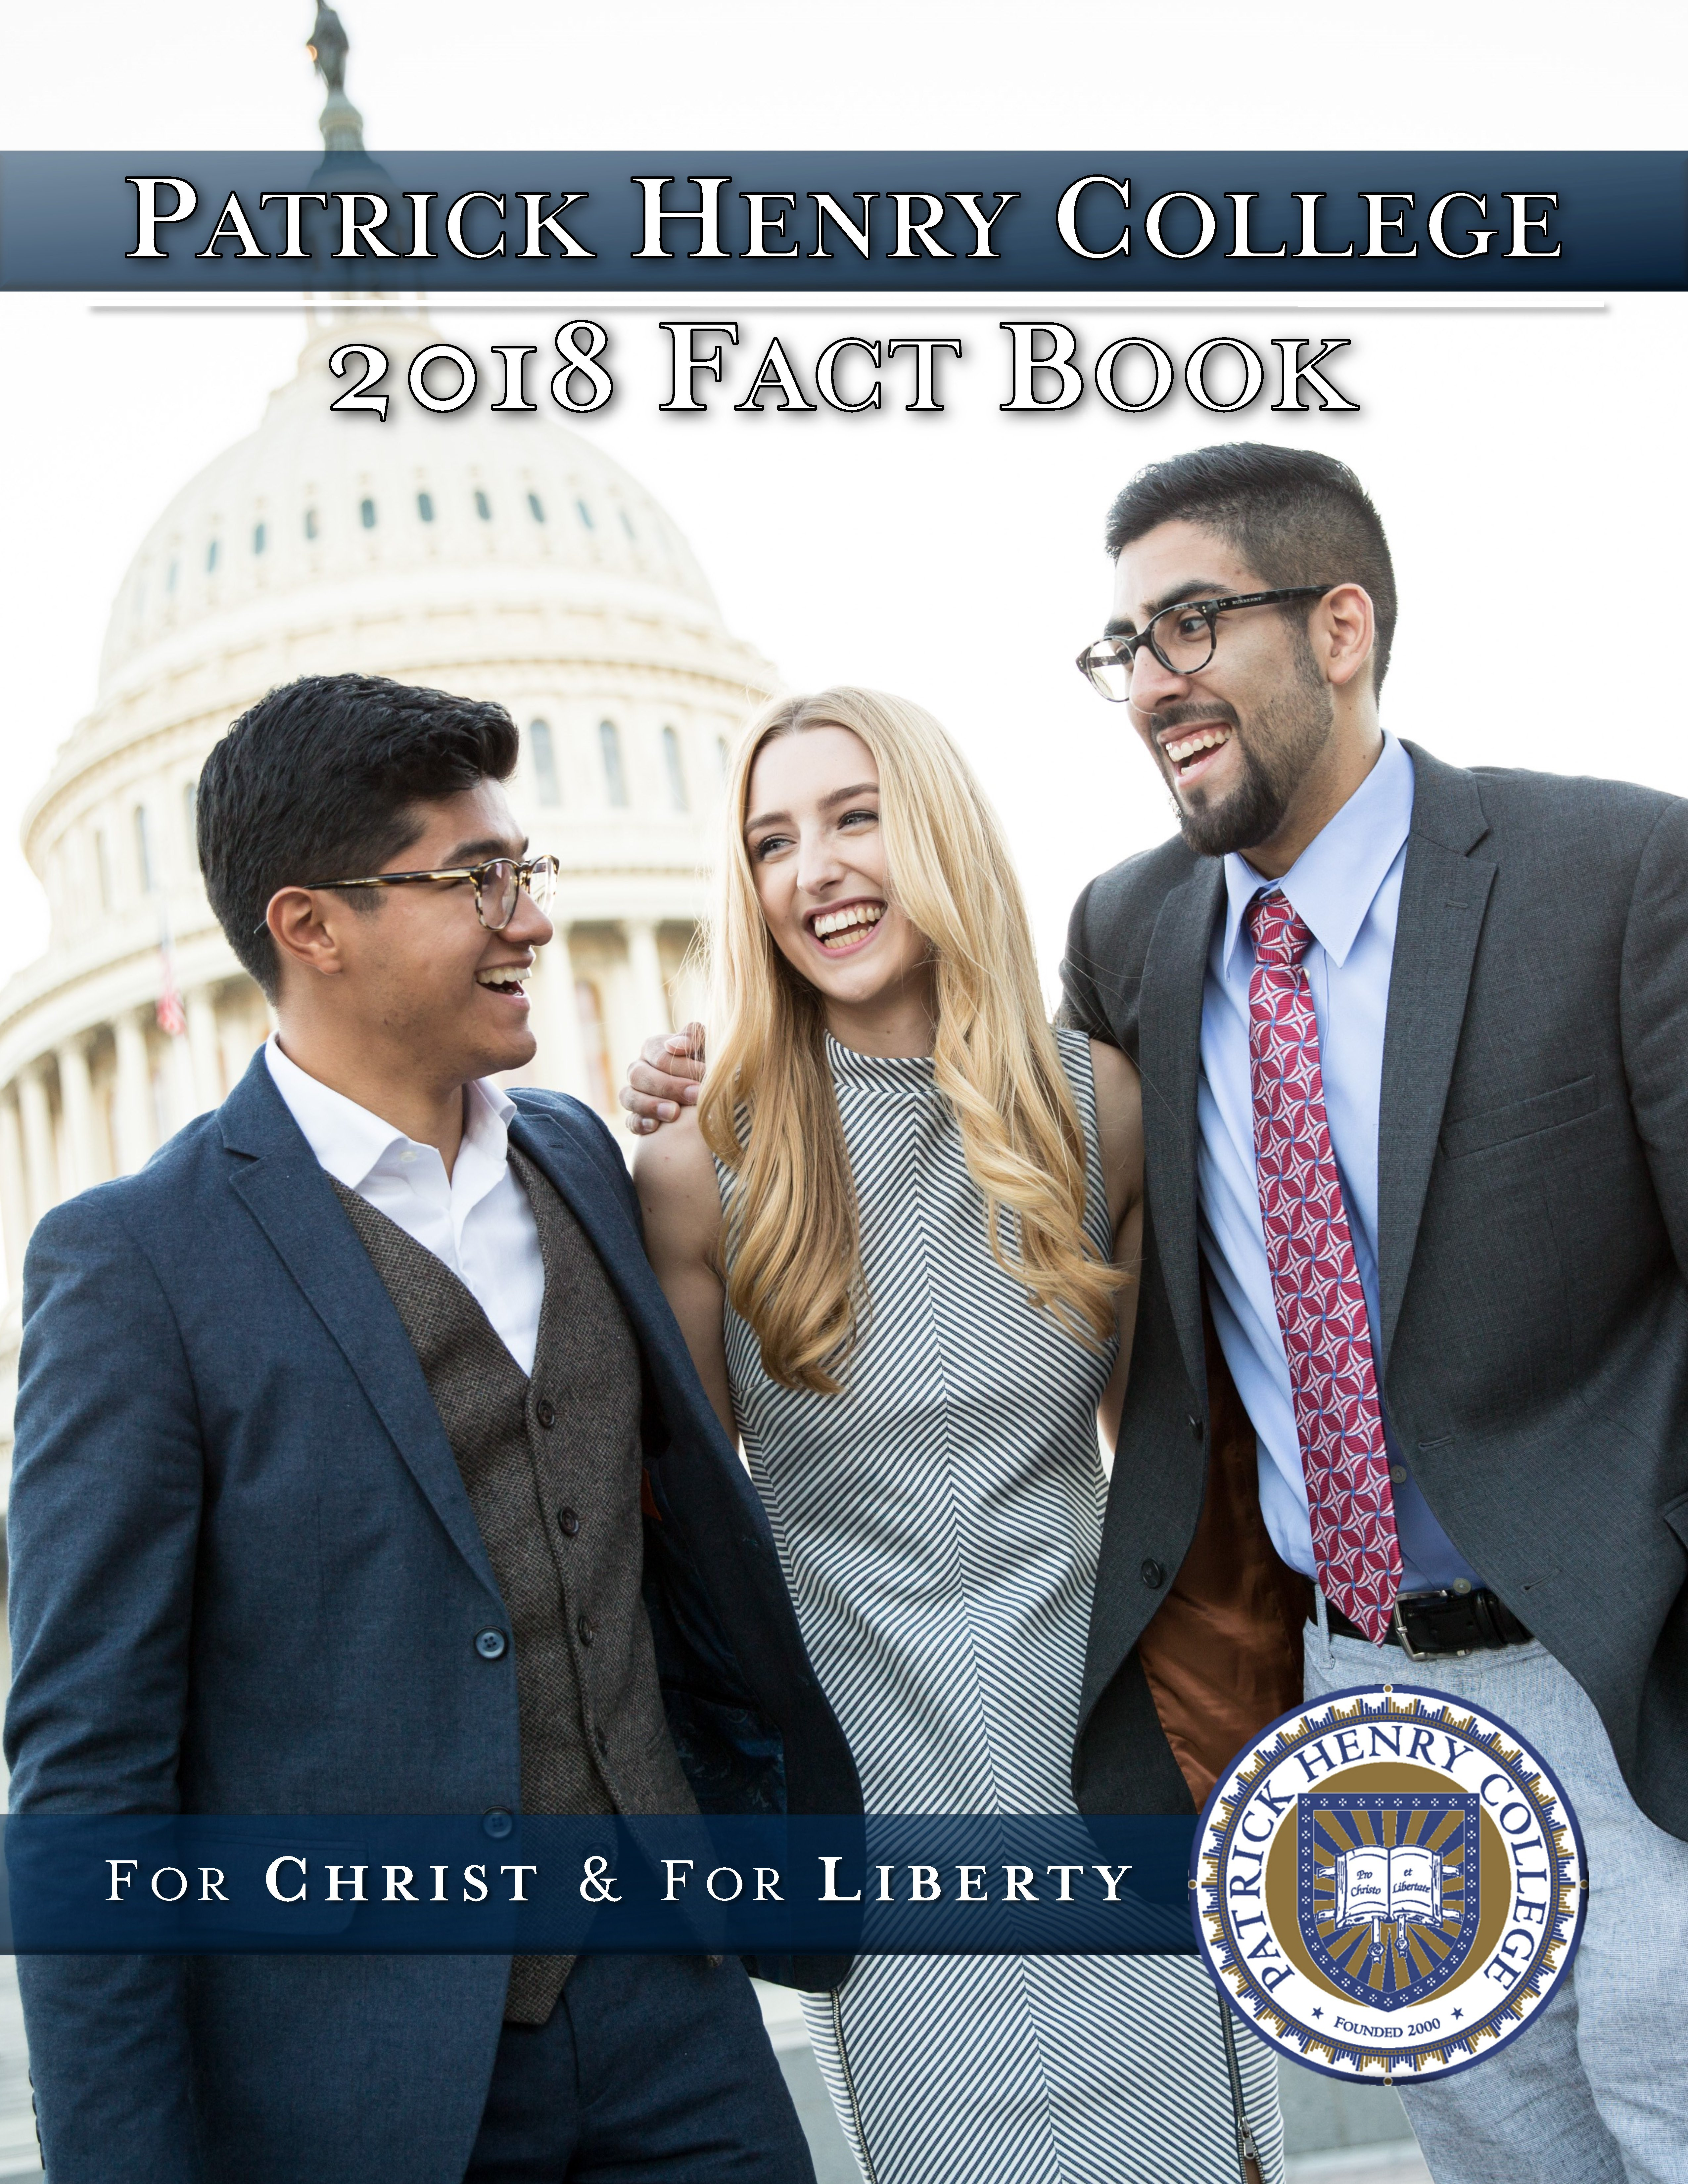 Patrick Henry College 2018 Factbook